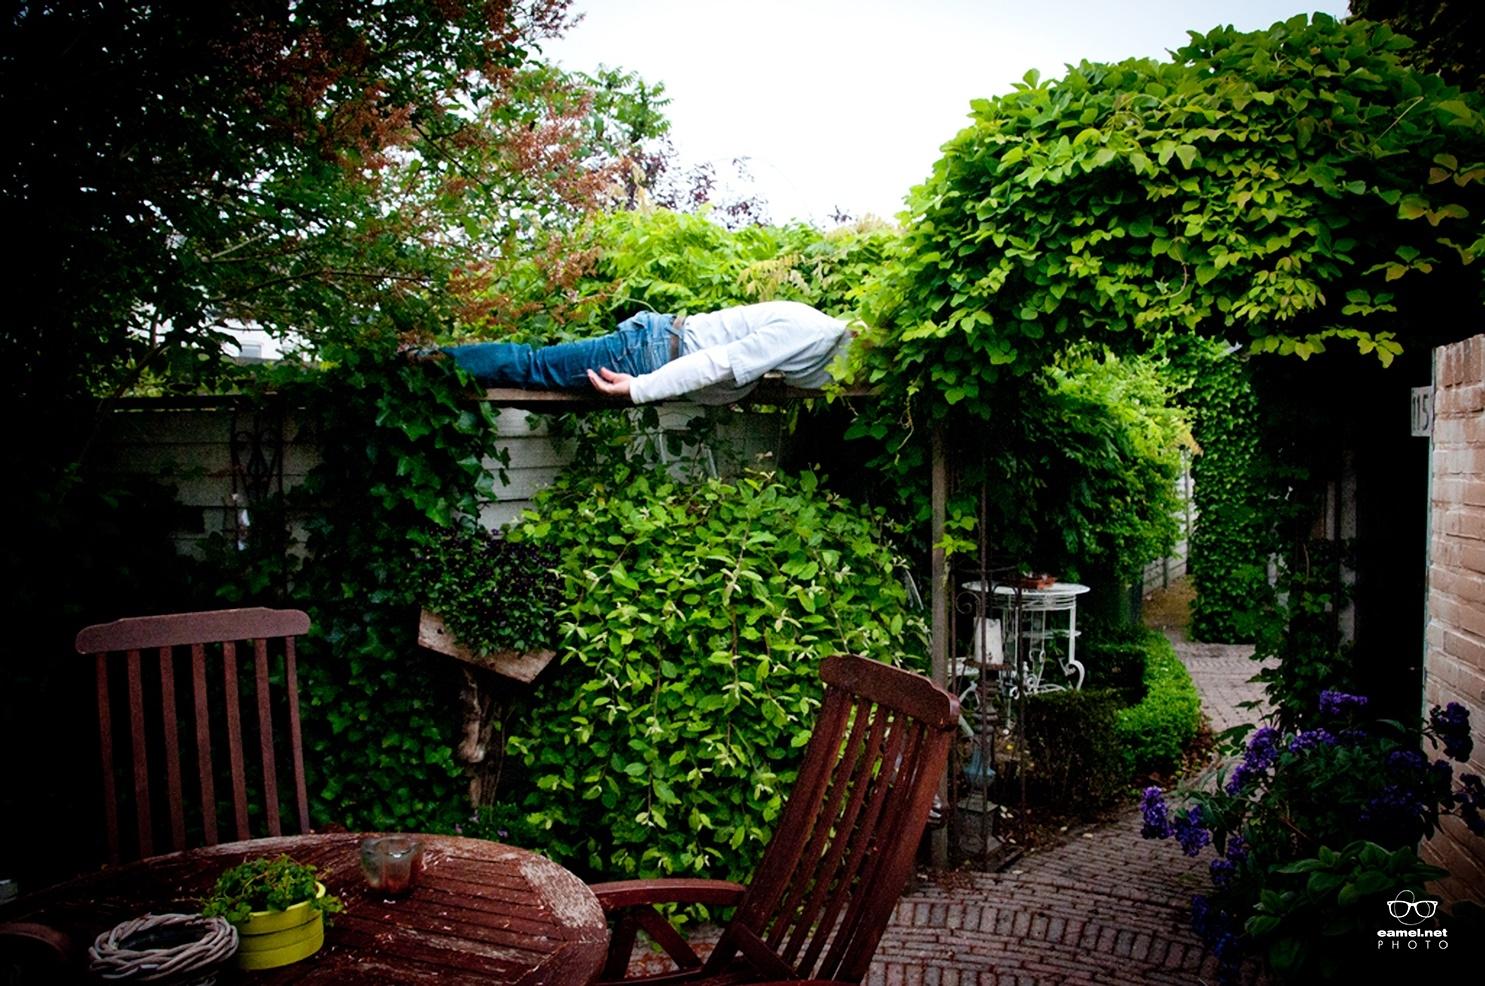 planking grut1 - Zoek de plank